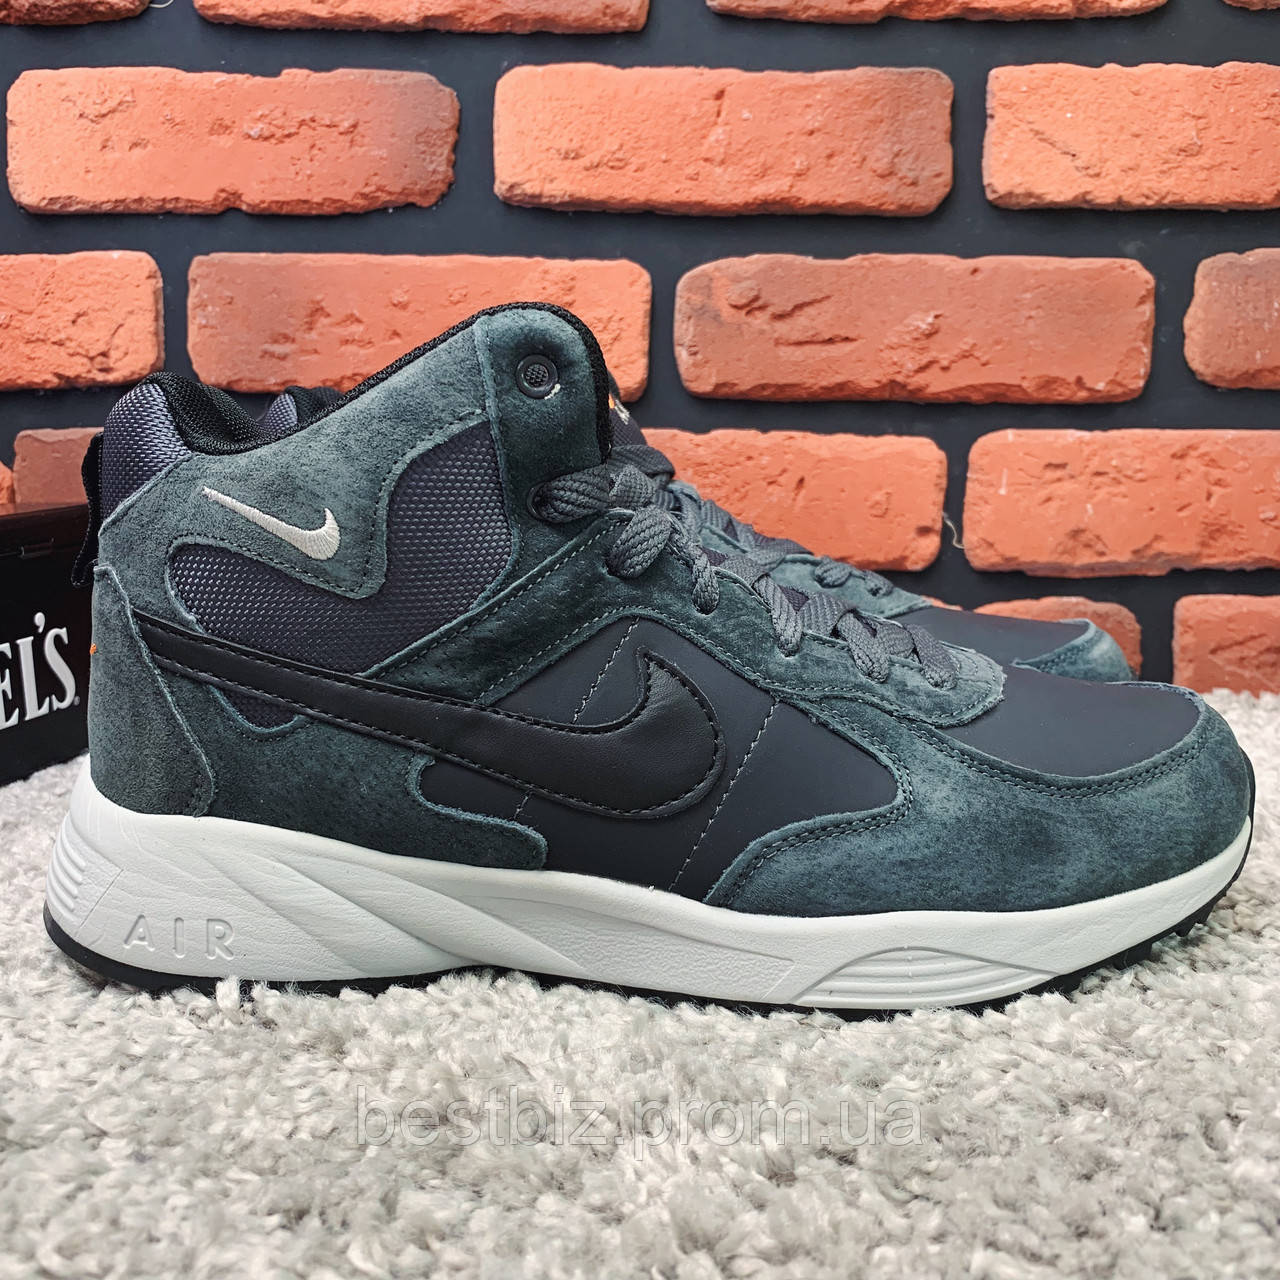 Зимние ботинки (НА МЕХУ) Nike  Air Max  1-119 ⏩ [ 43,46 ]